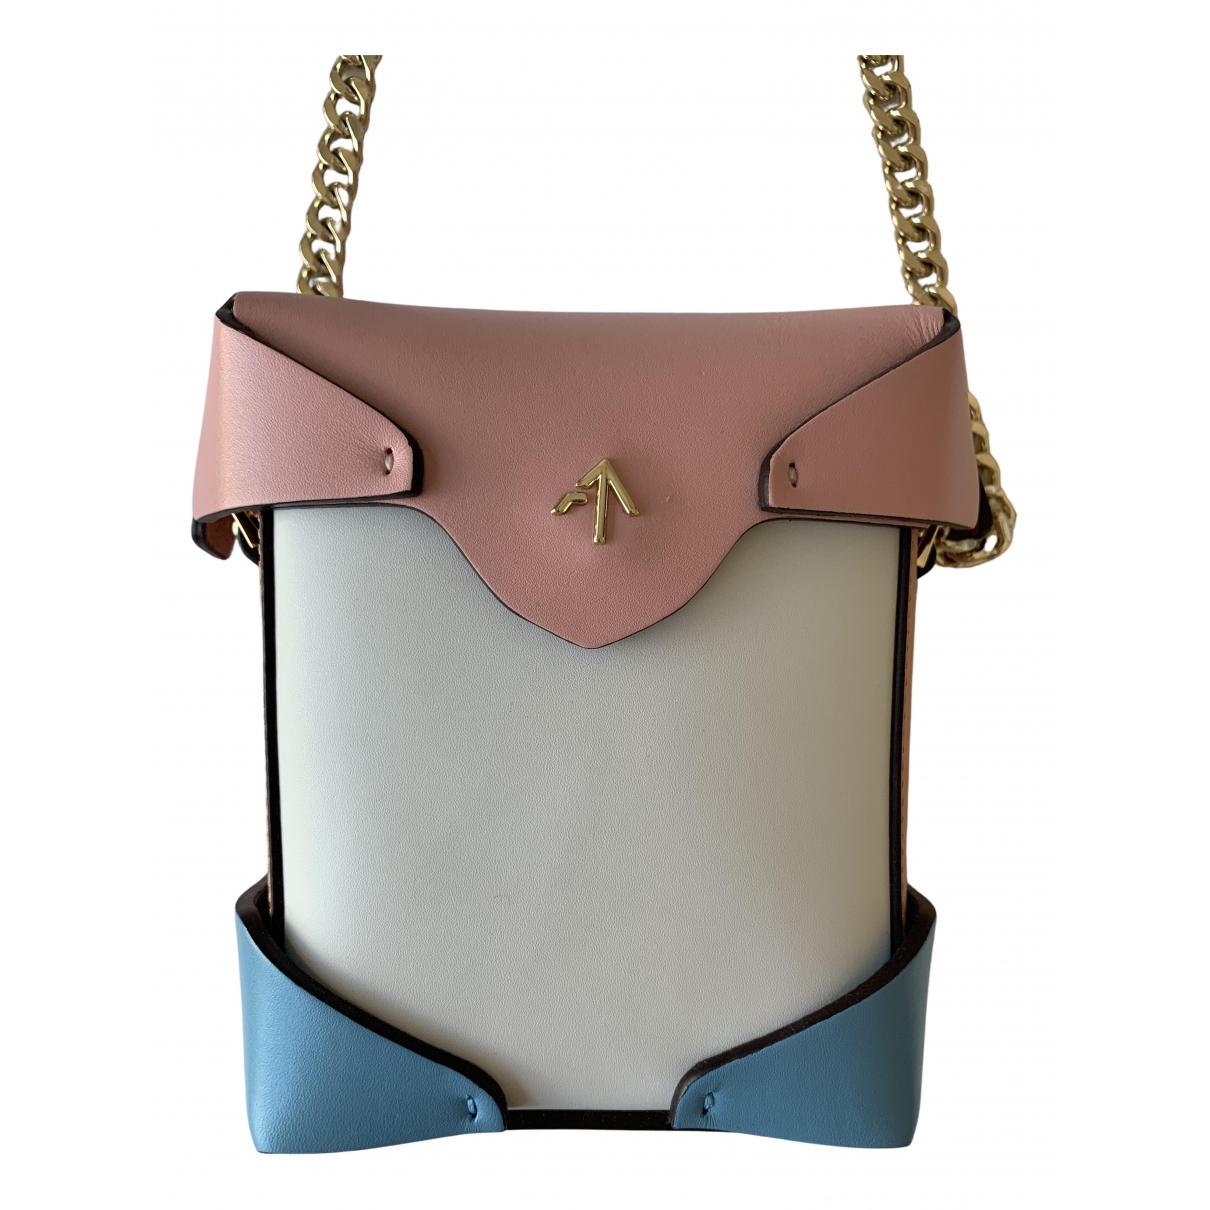 Manu Atelier \N Handtasche in  Bunt Leder